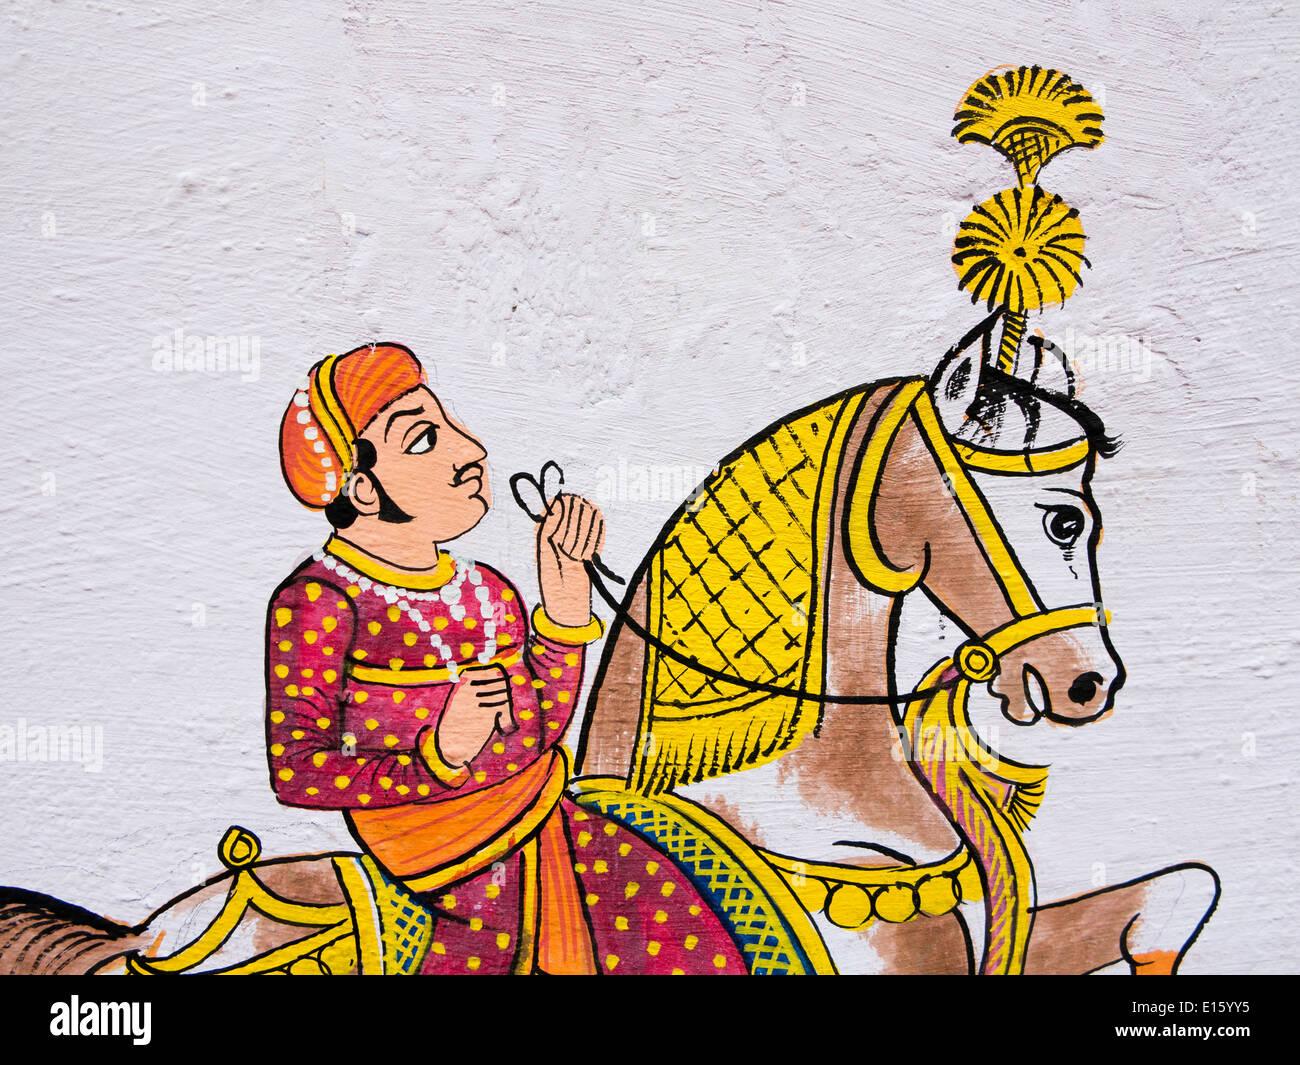 India Rajasthan, Udaipur, tradizionale pittura murale di Rajput uomo a cavallo Immagini Stock